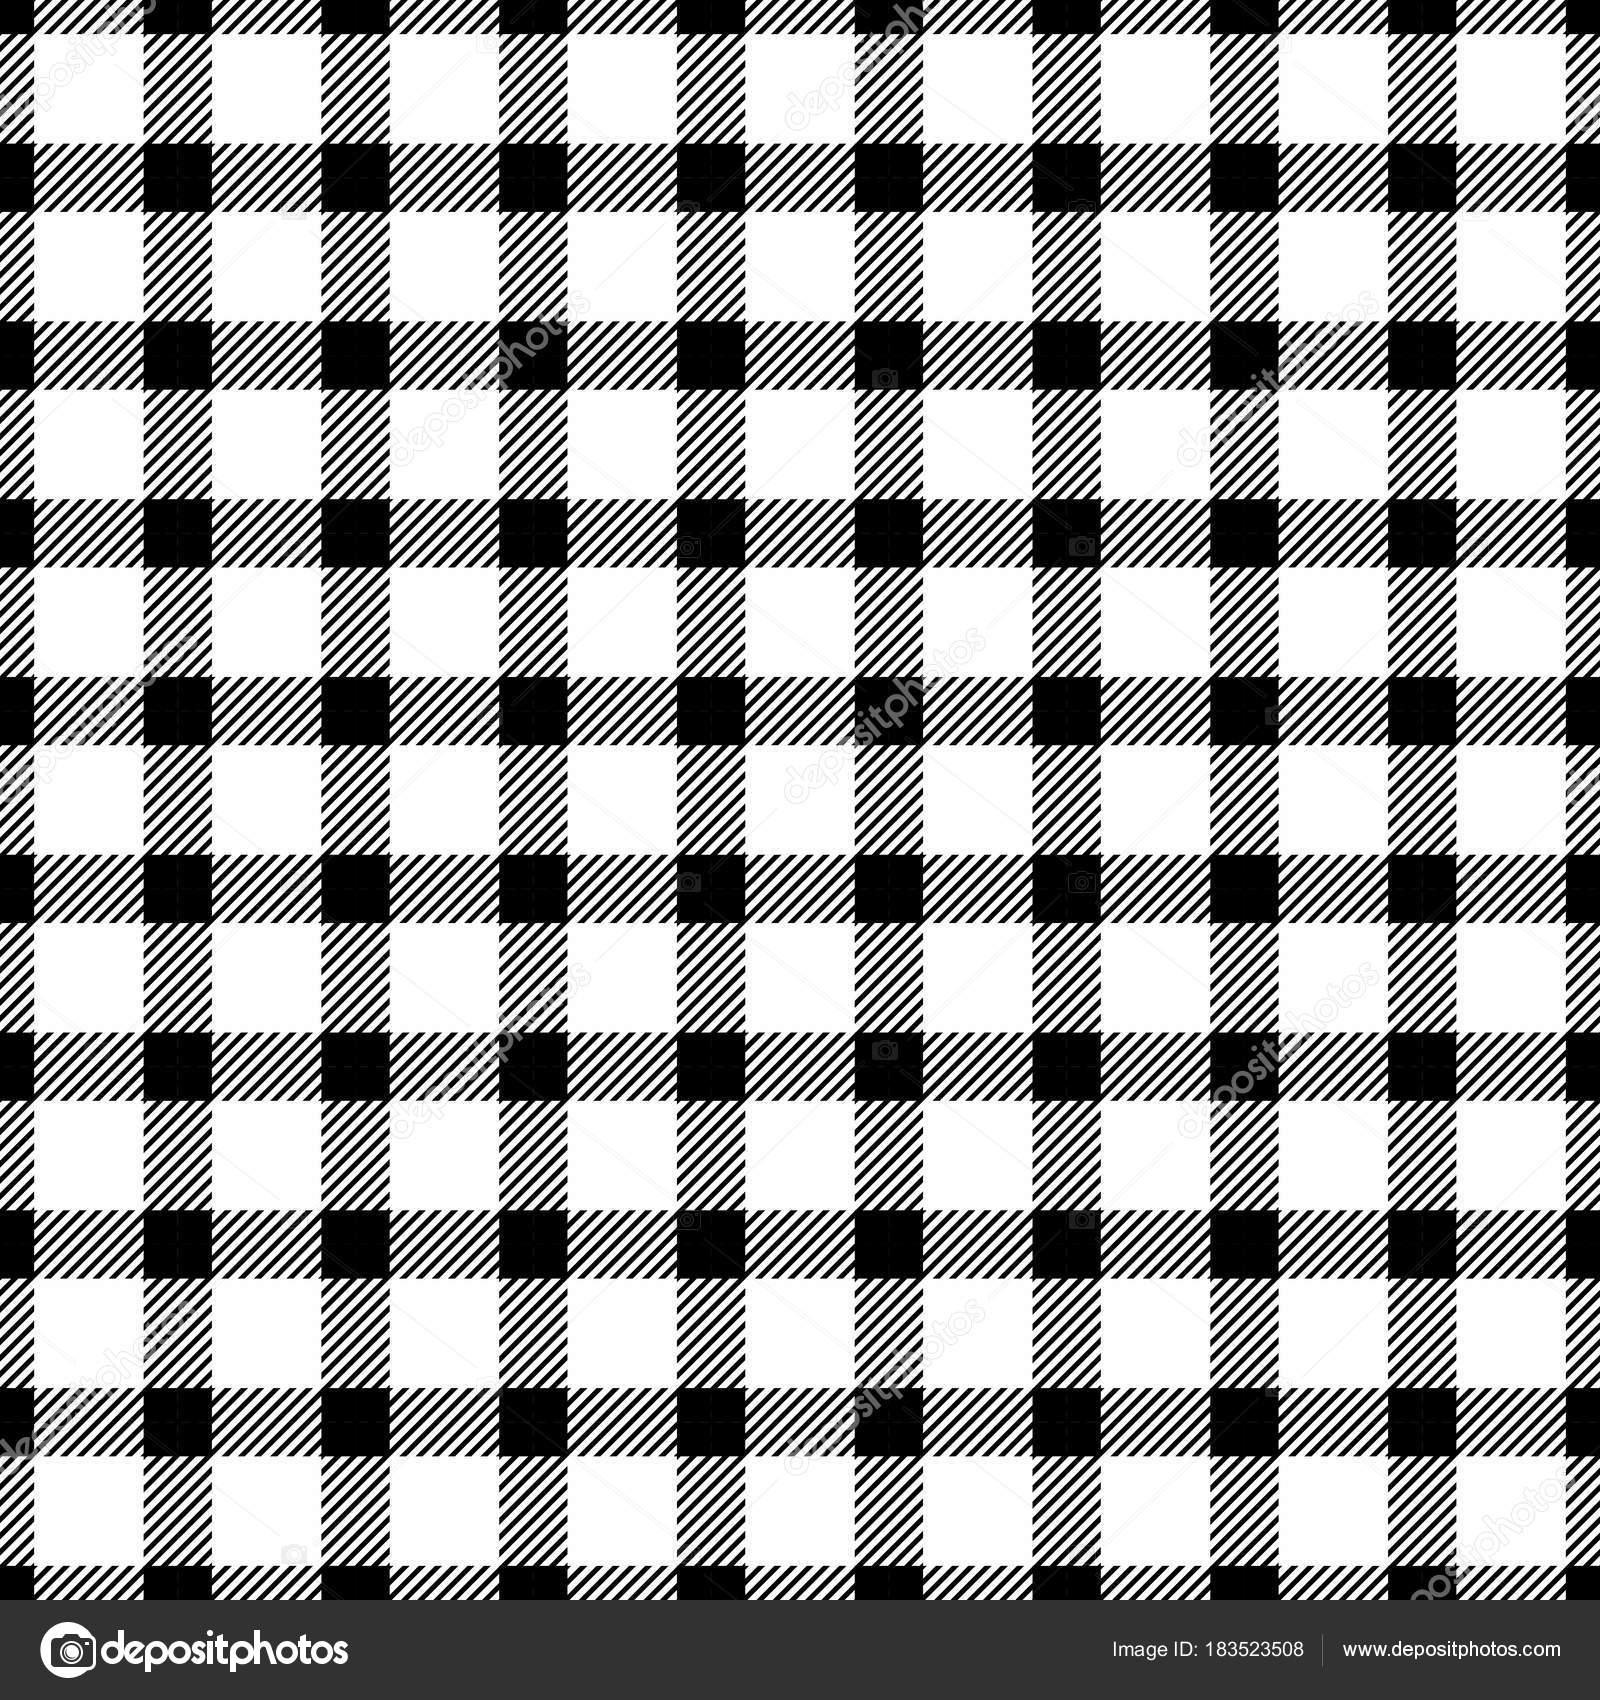 Vetor Preto E Branco Sem Costura Monocrom Tico Xadrez Padr O Para